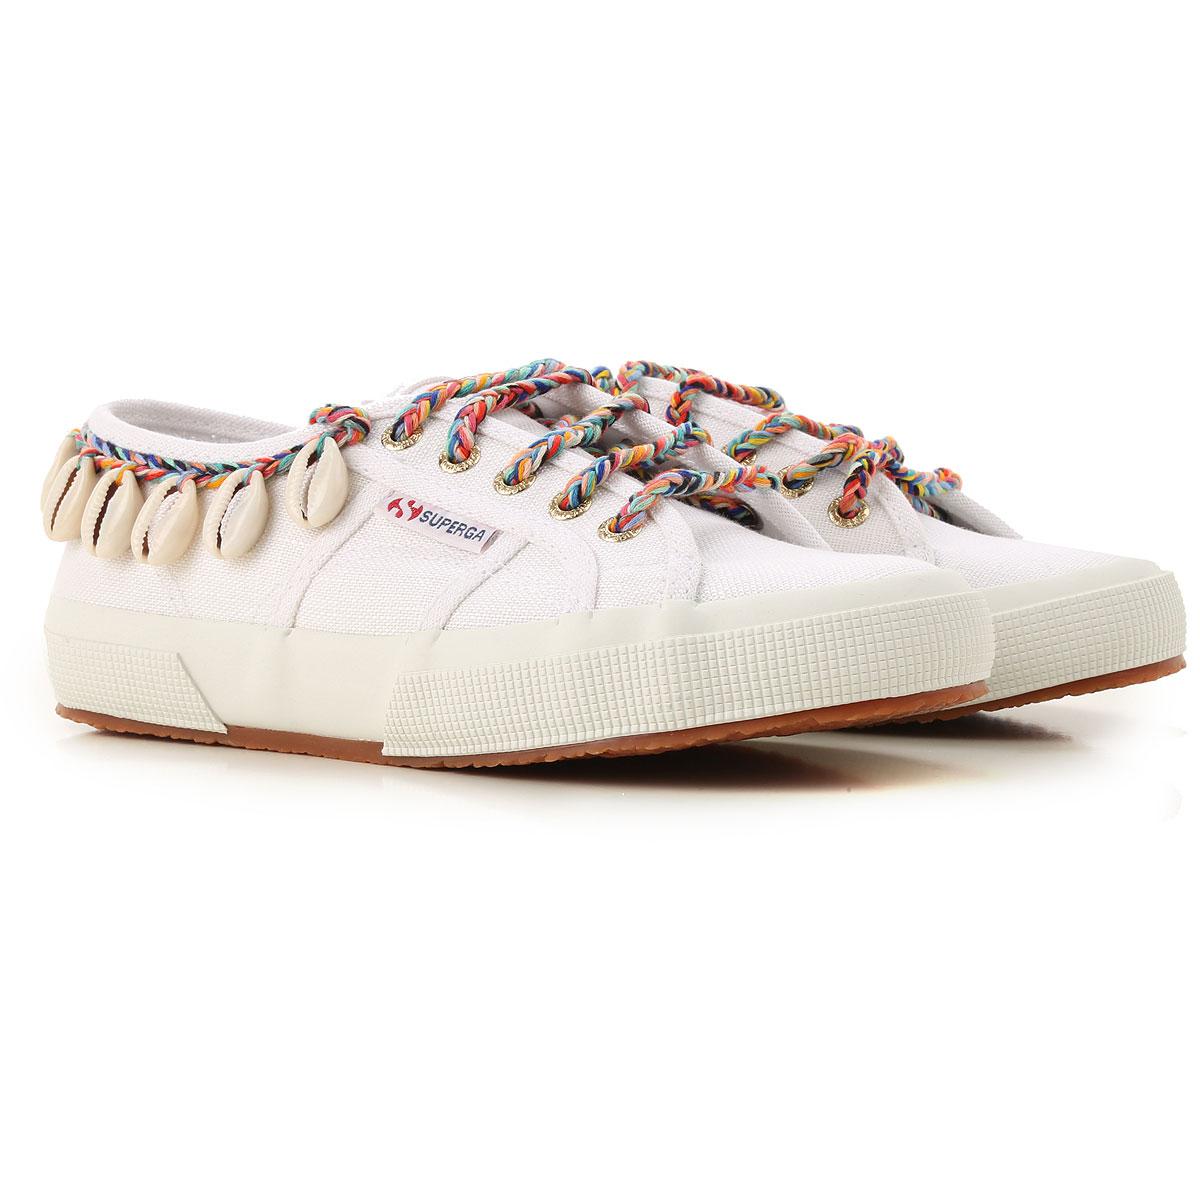 Superga Sneakers for Women On Sale, Superga X Alanui, White, Canvas, 2019, ITA 41 - USA 10.5 - UK 8 ITA 40 - USA 9.5 - UK 7